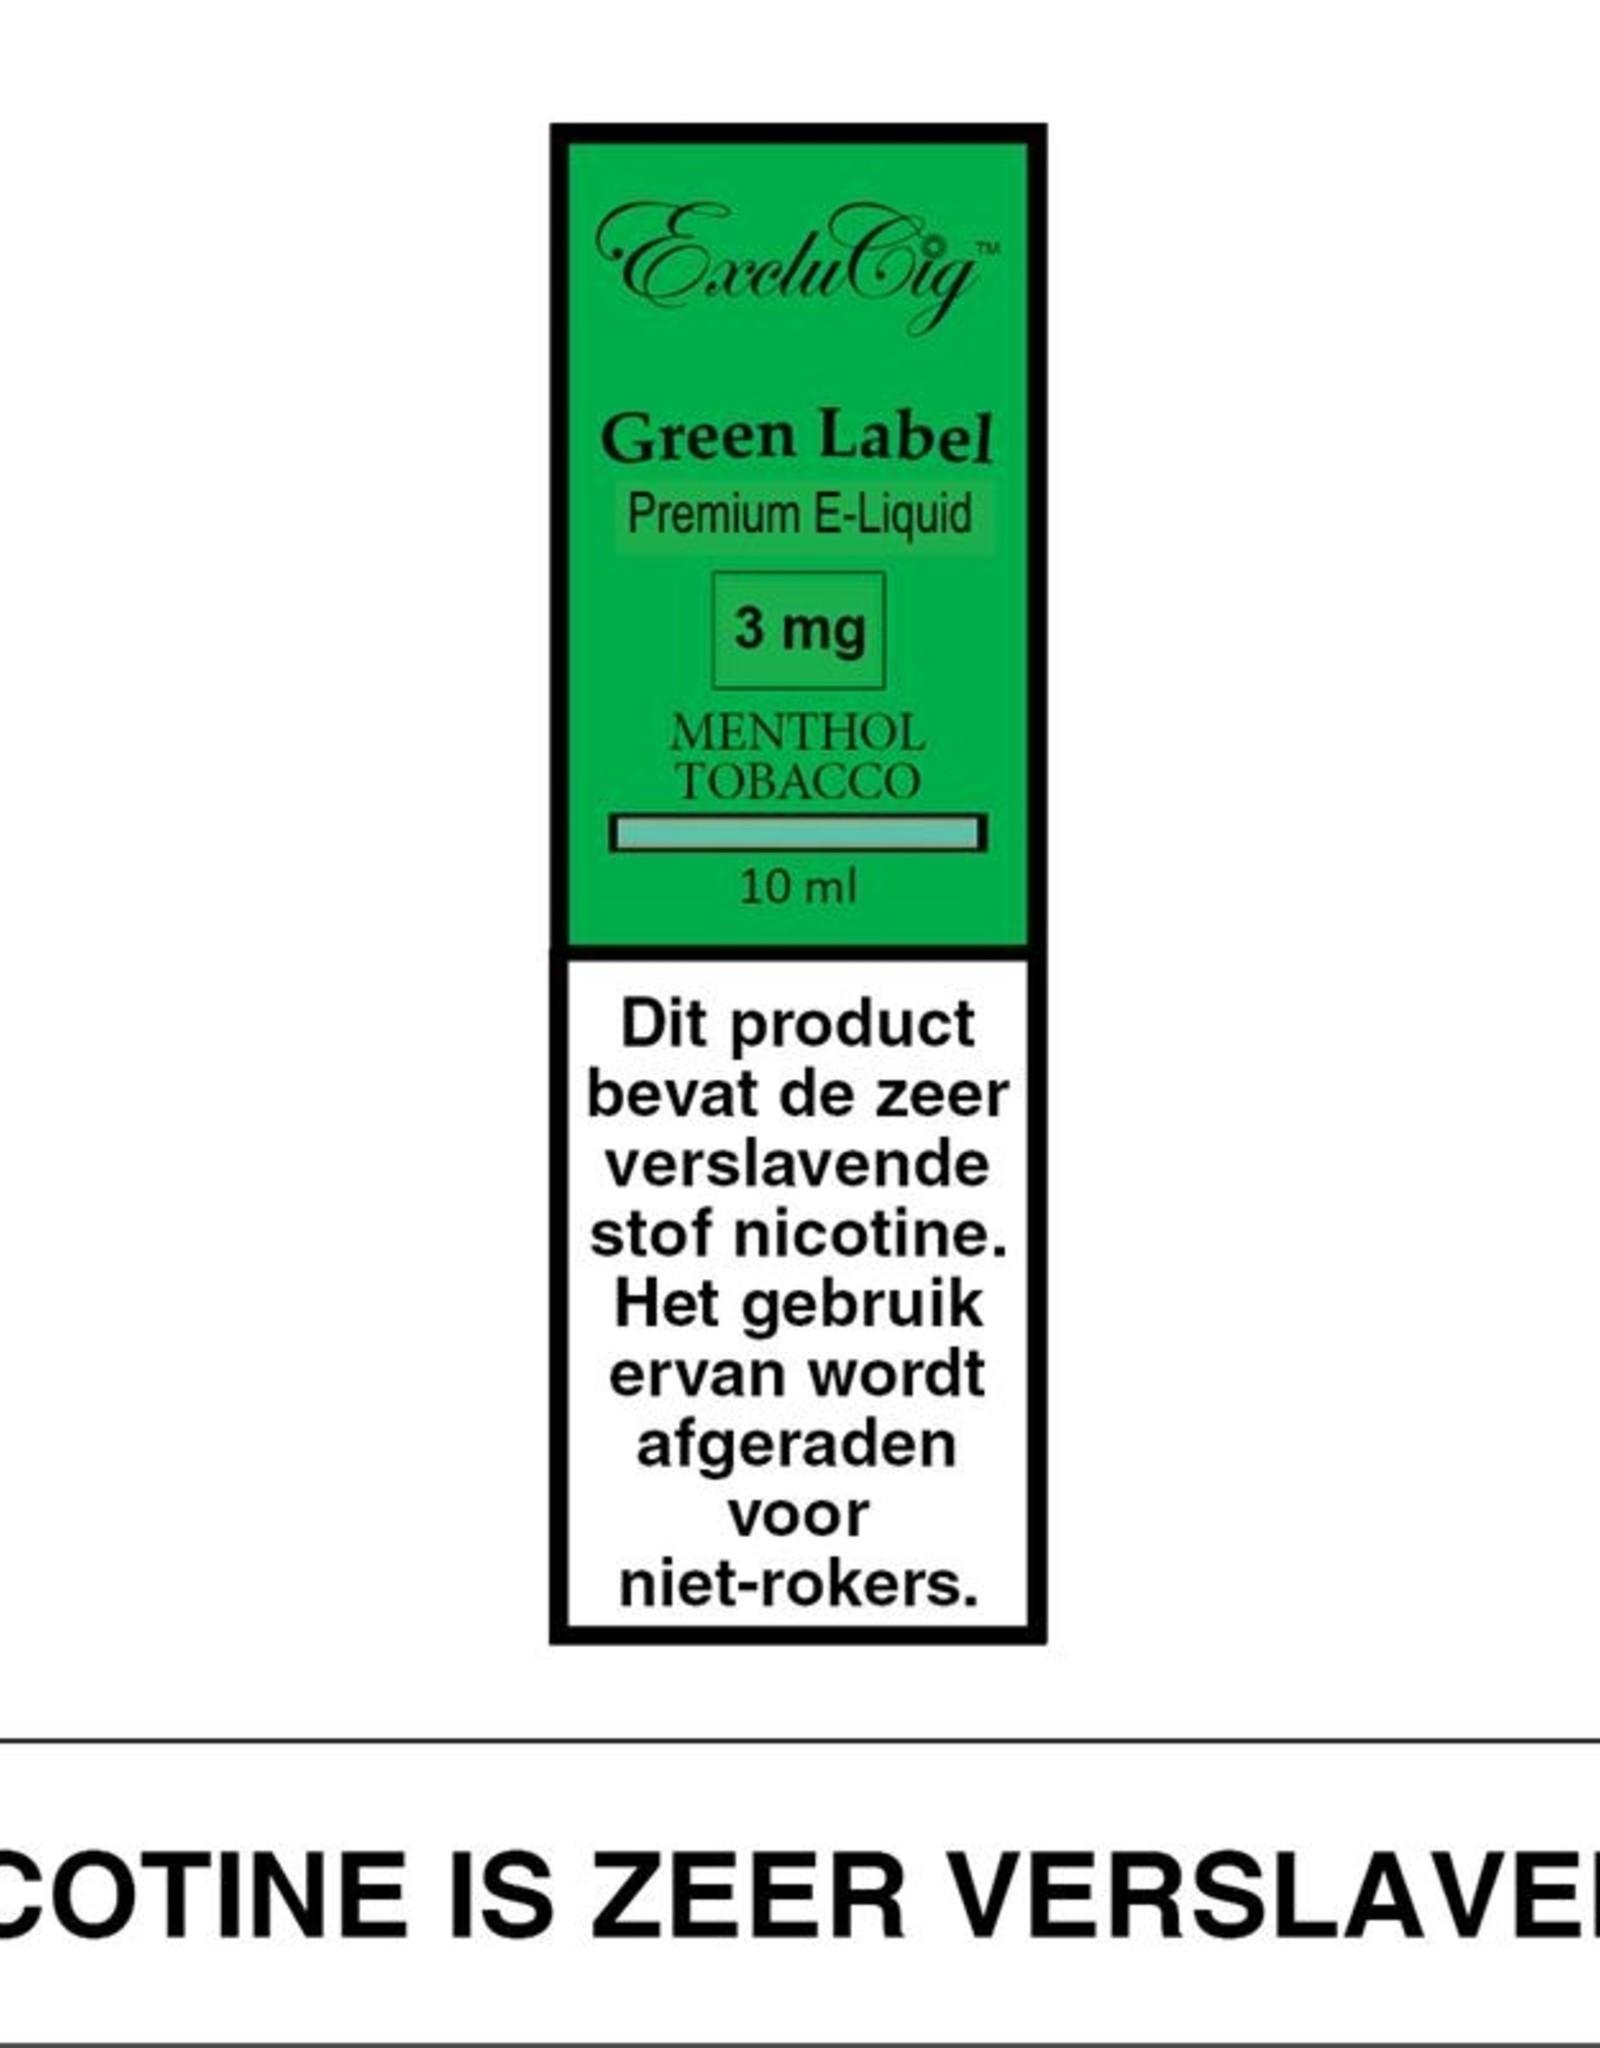 Exclucig Exclucig Green Label E-liquid Menthol Tobacco 3 mg Nicotine